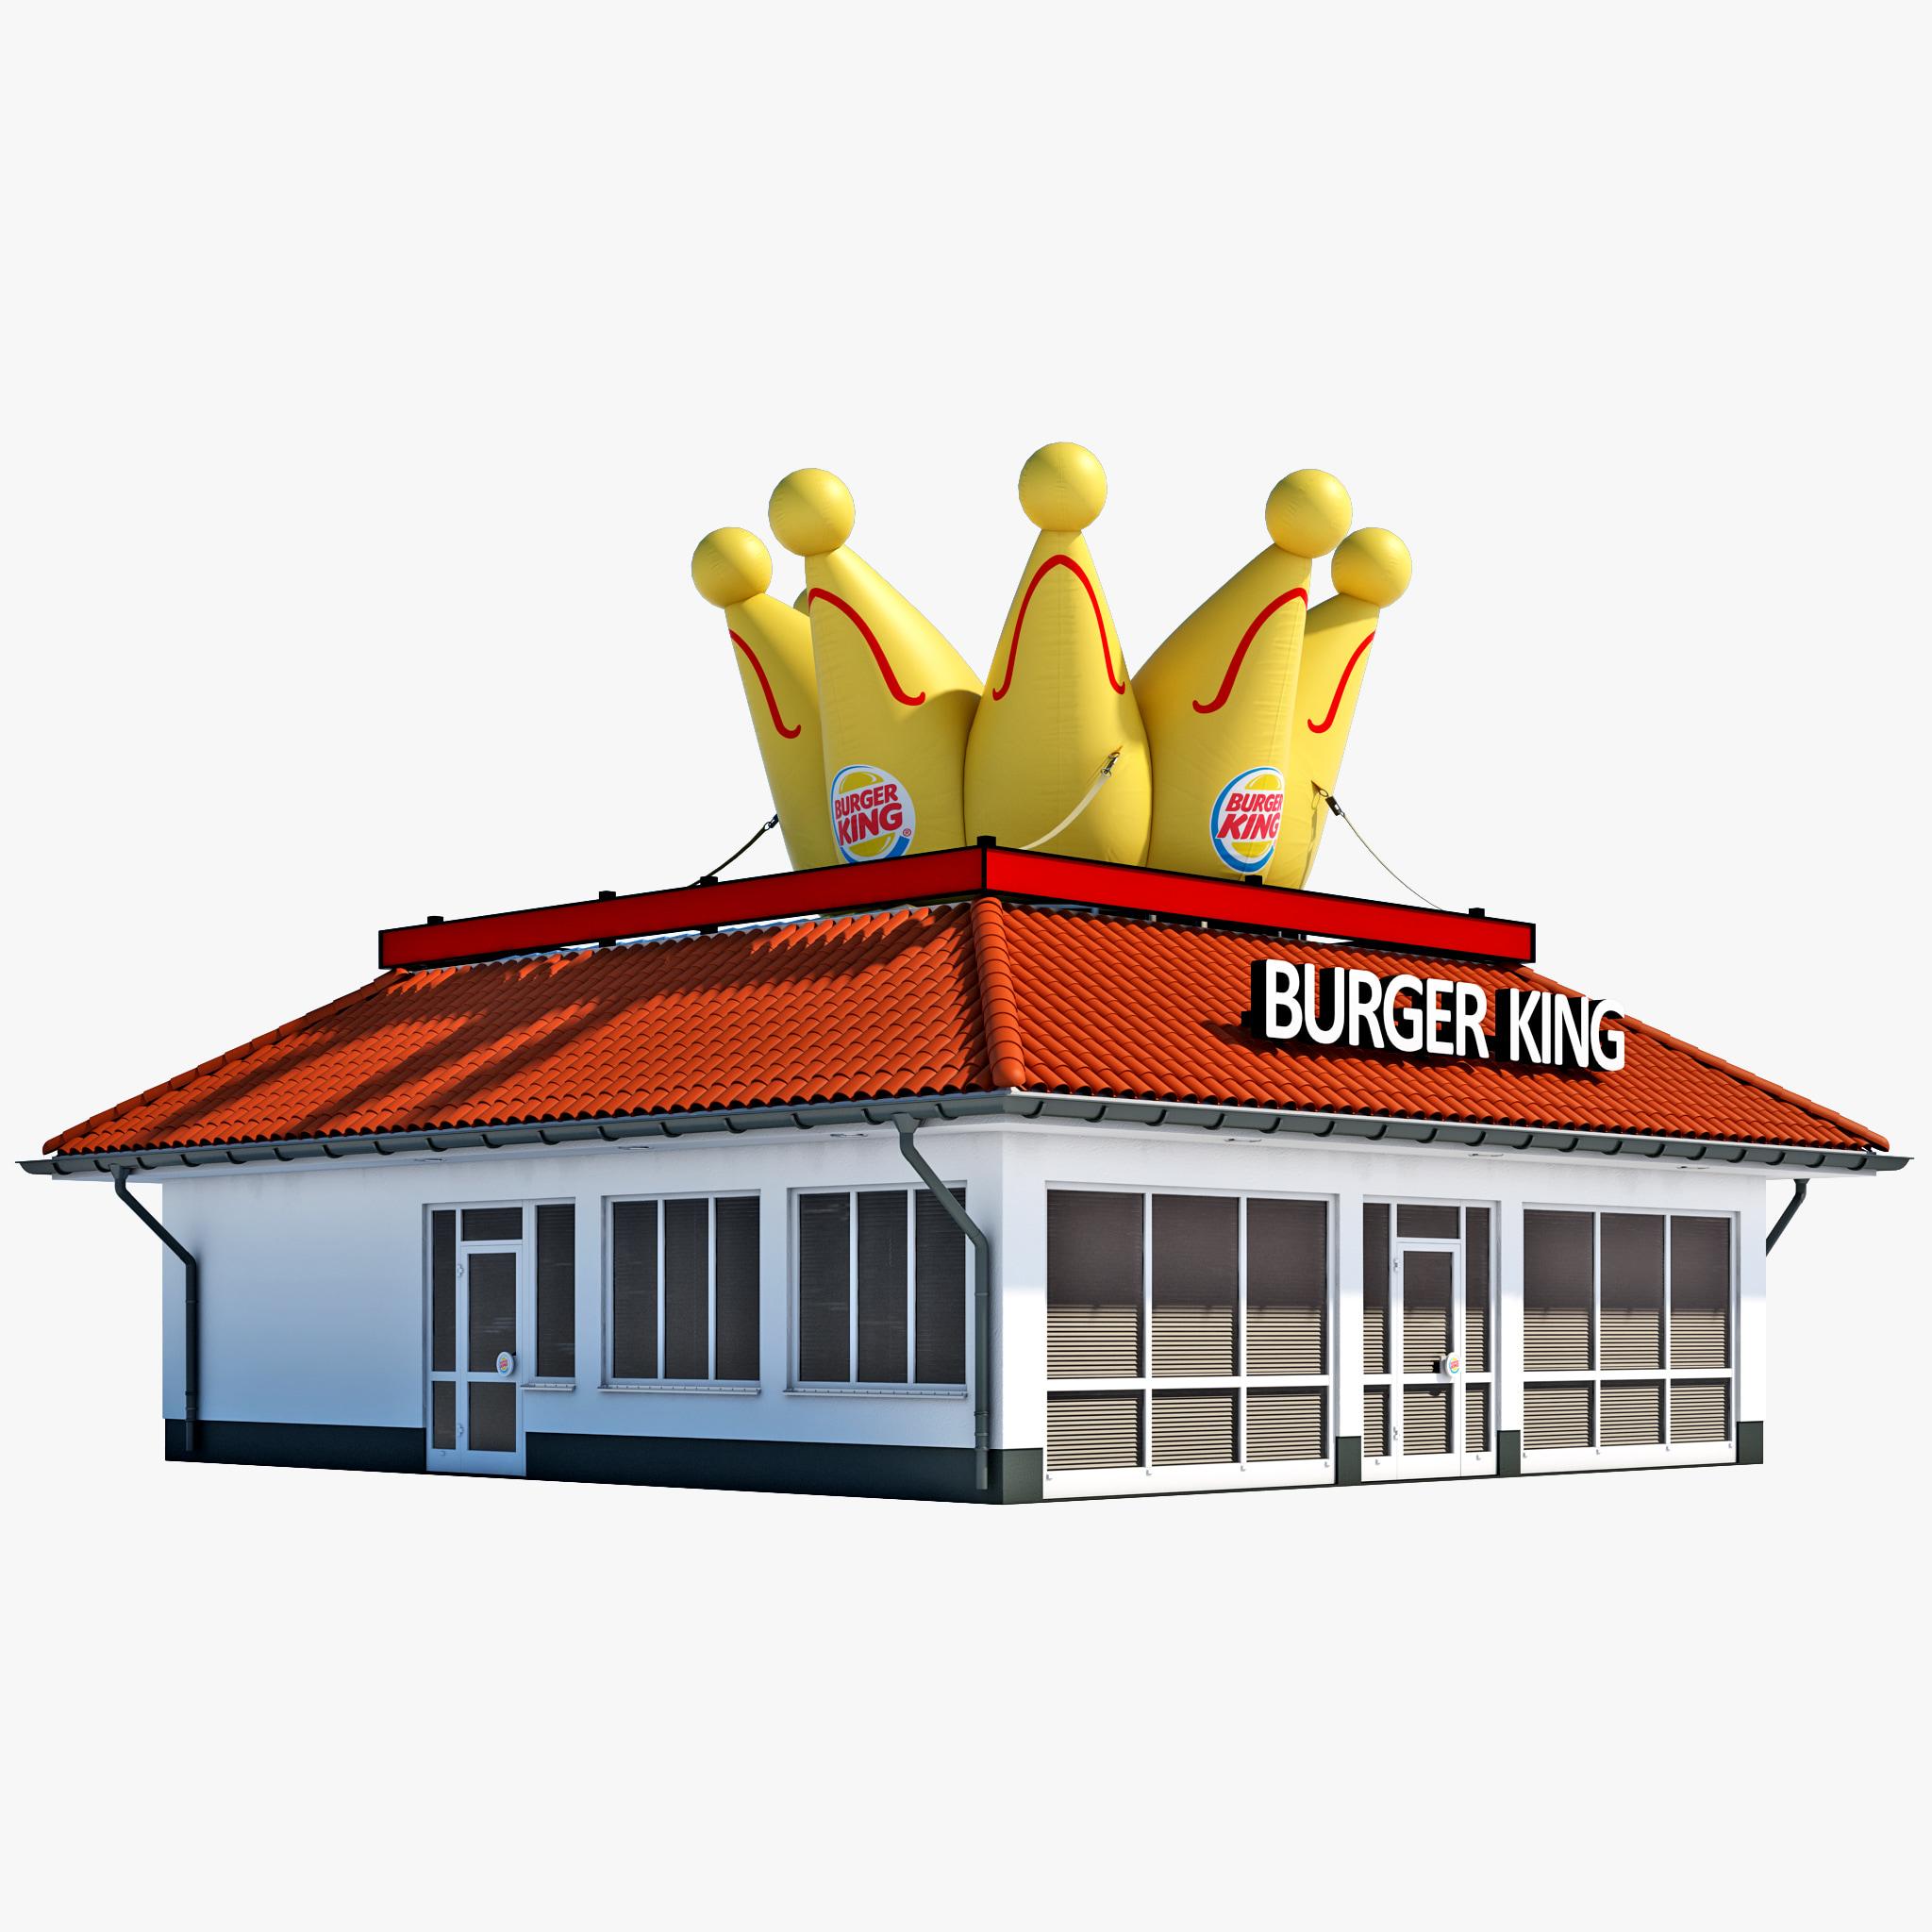 Max Burger King Restaurant